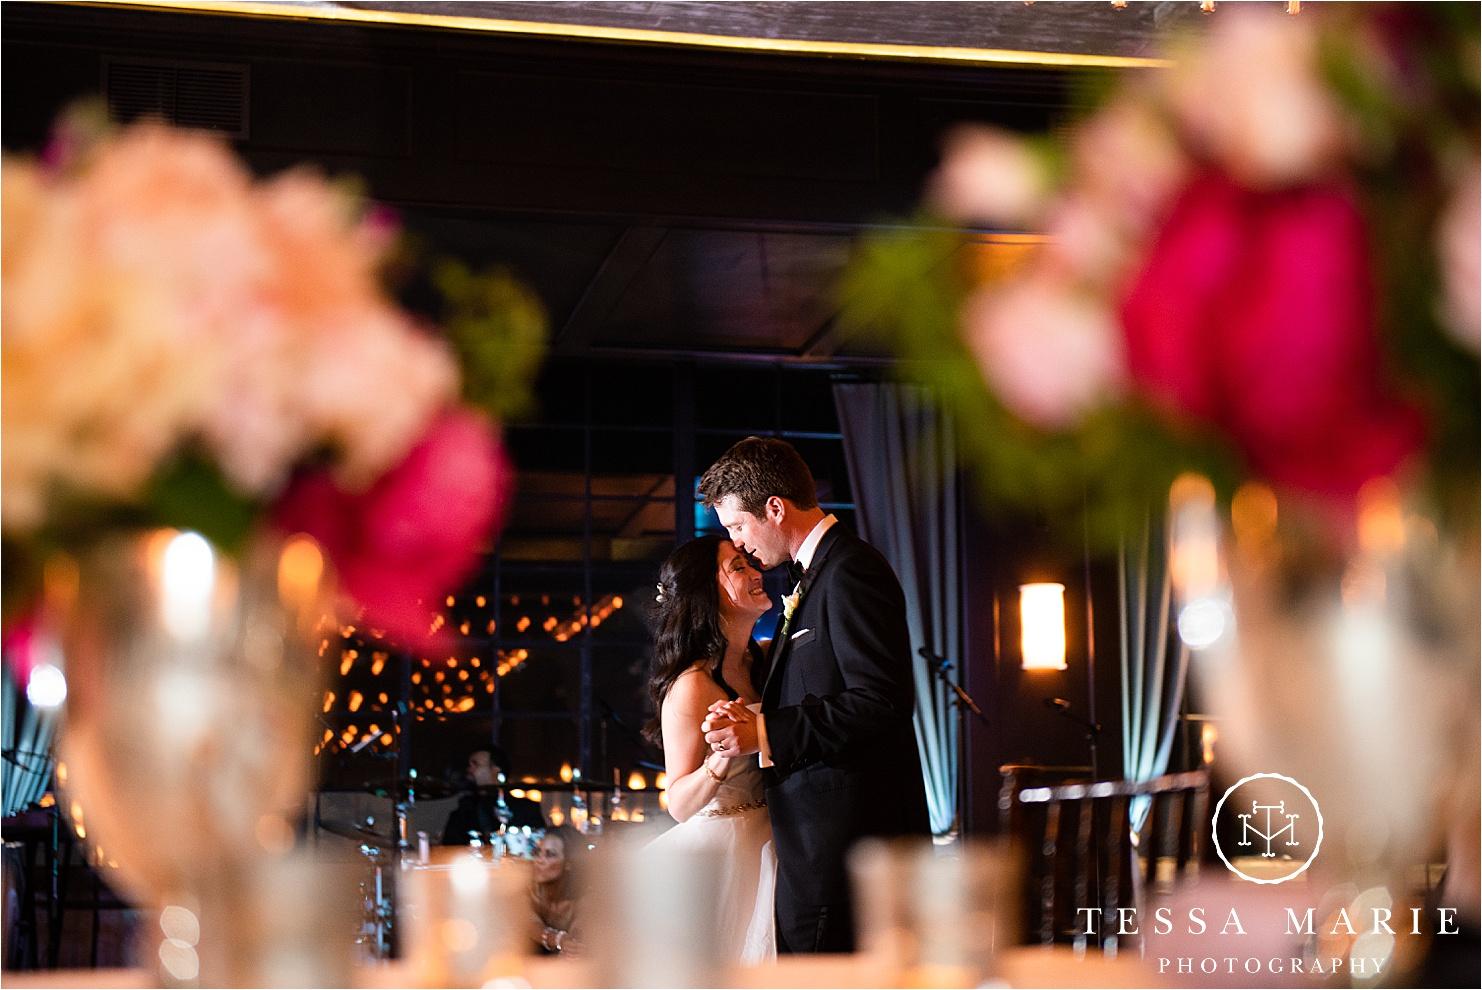 Tessa_marie_weddings_houston_wedding_photographer_The_astorian_0185.jpg